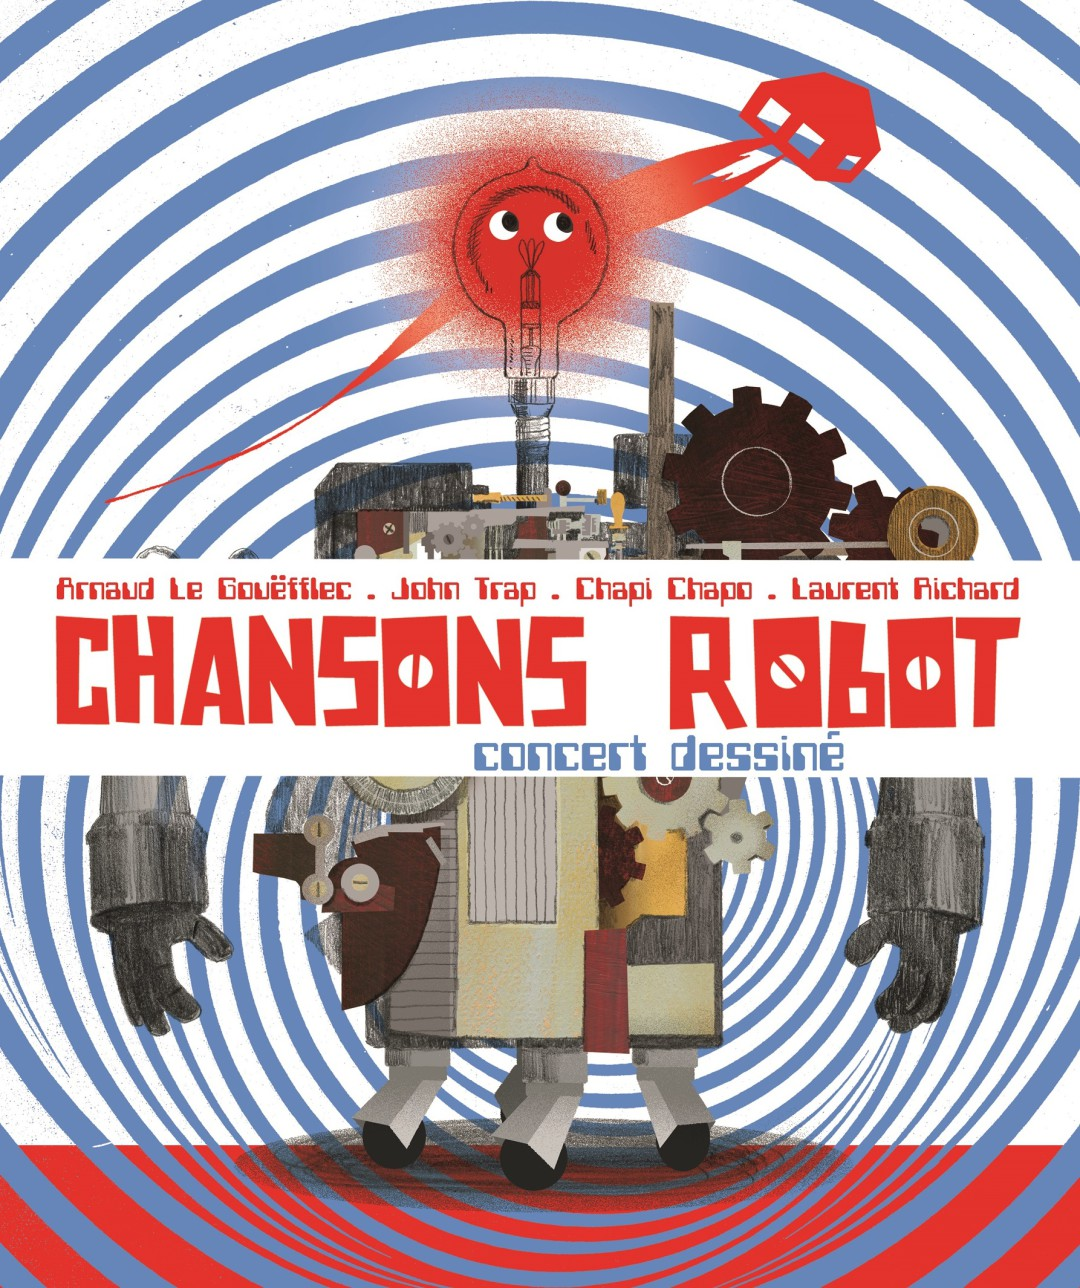 visuel chansons robot HD